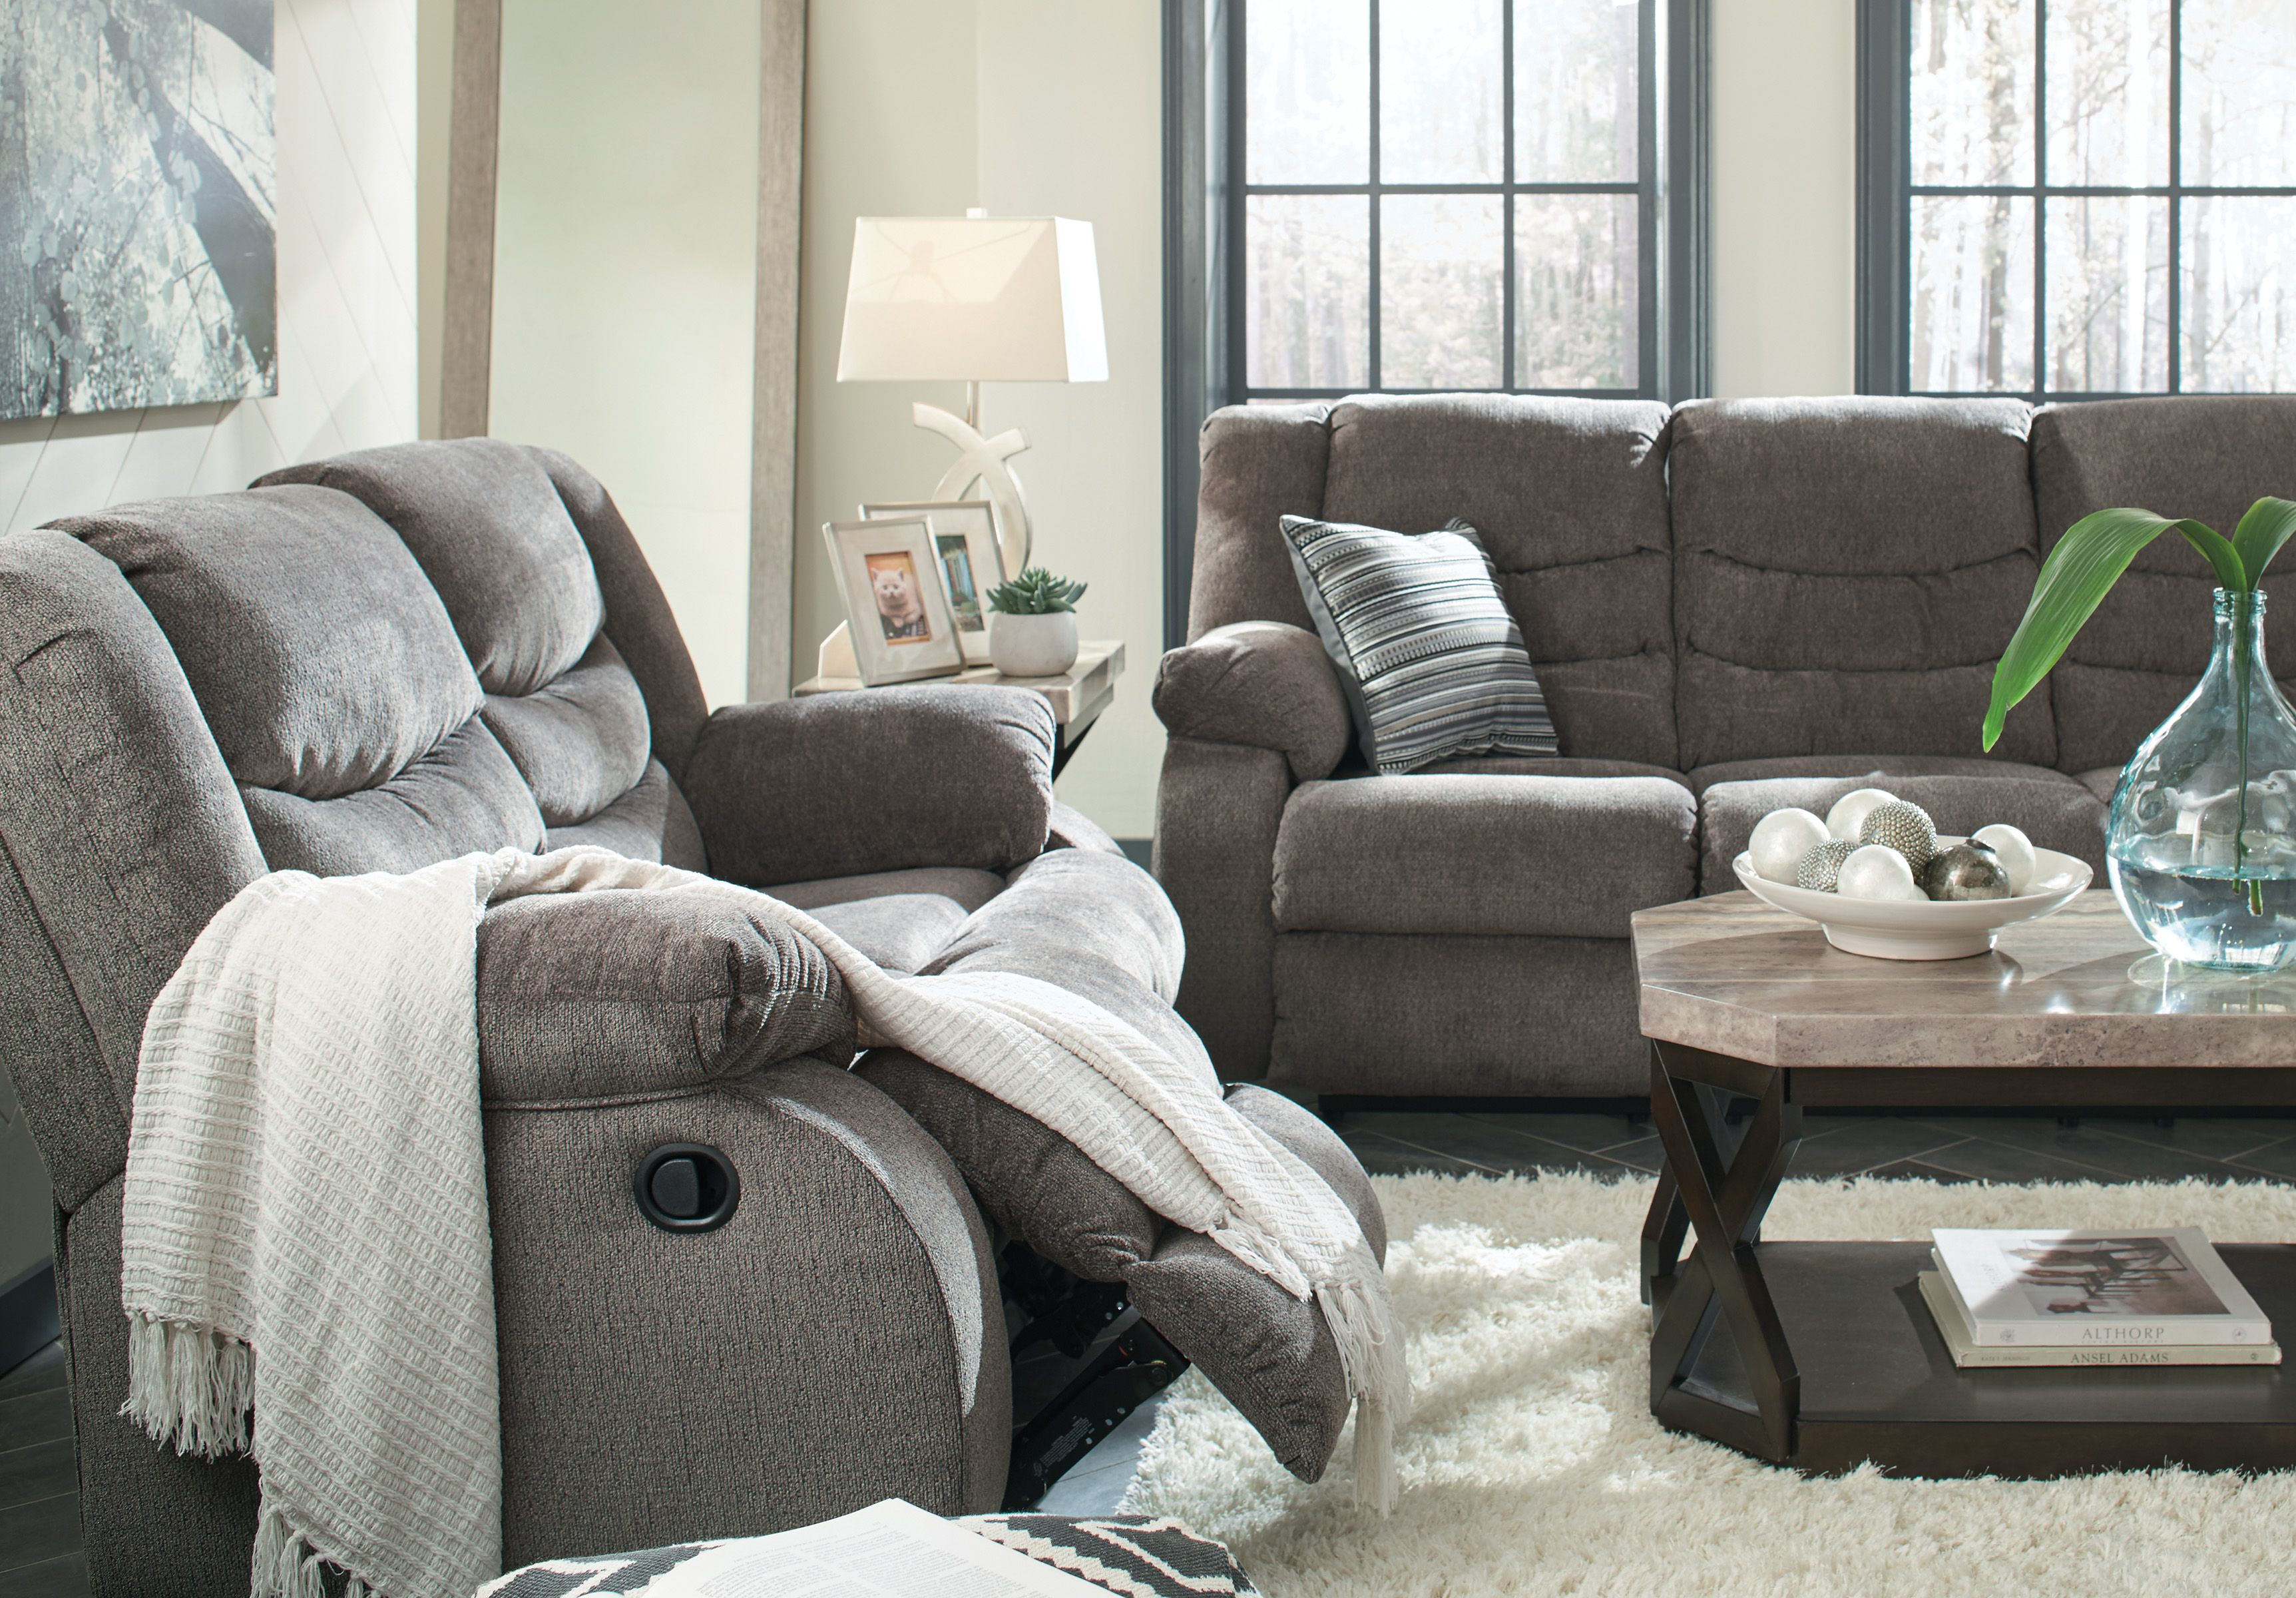 Ashley Tulen Reclining Sofa Homemakers Furniture Contemporary Decor Living Room Living Room Designs Classy Living Room